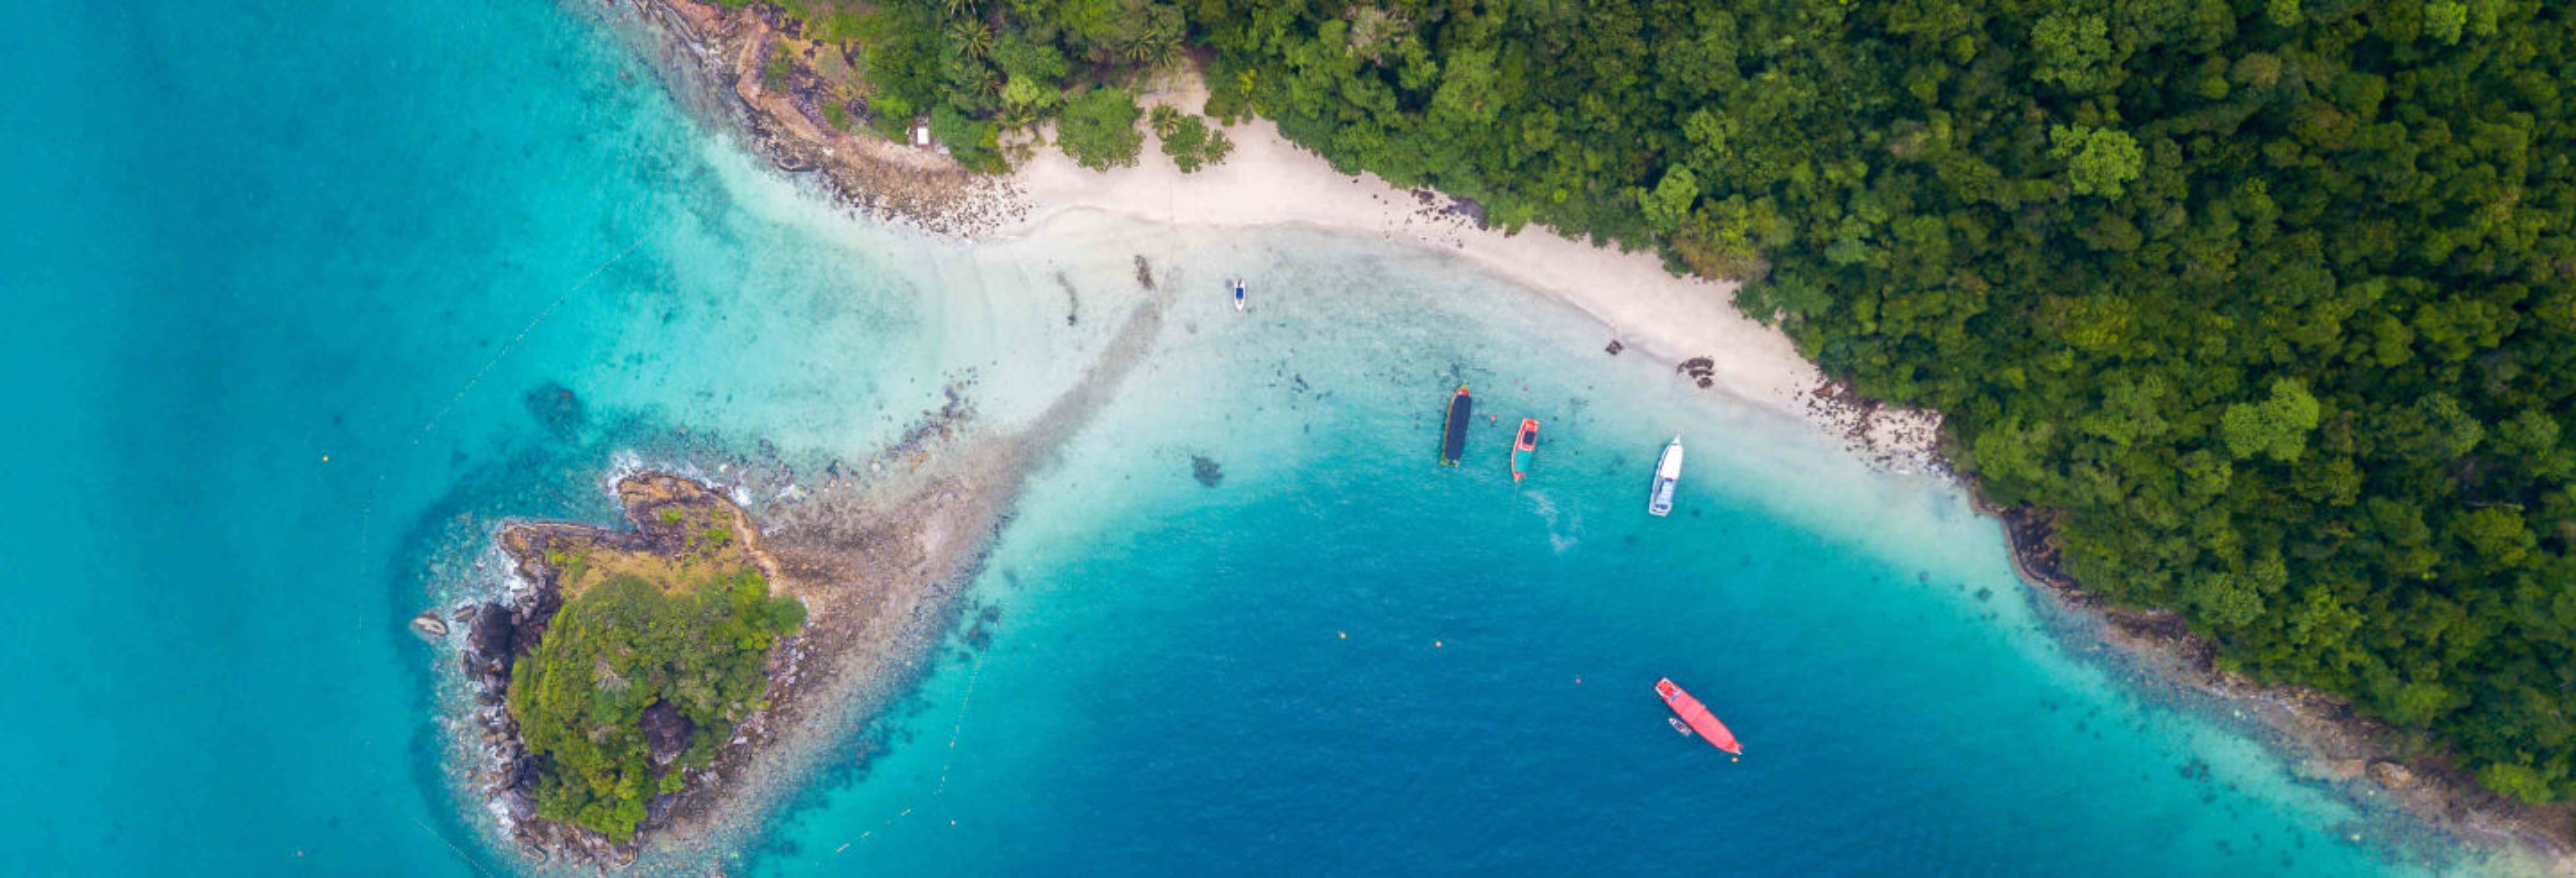 Snorkel en Koh Rang